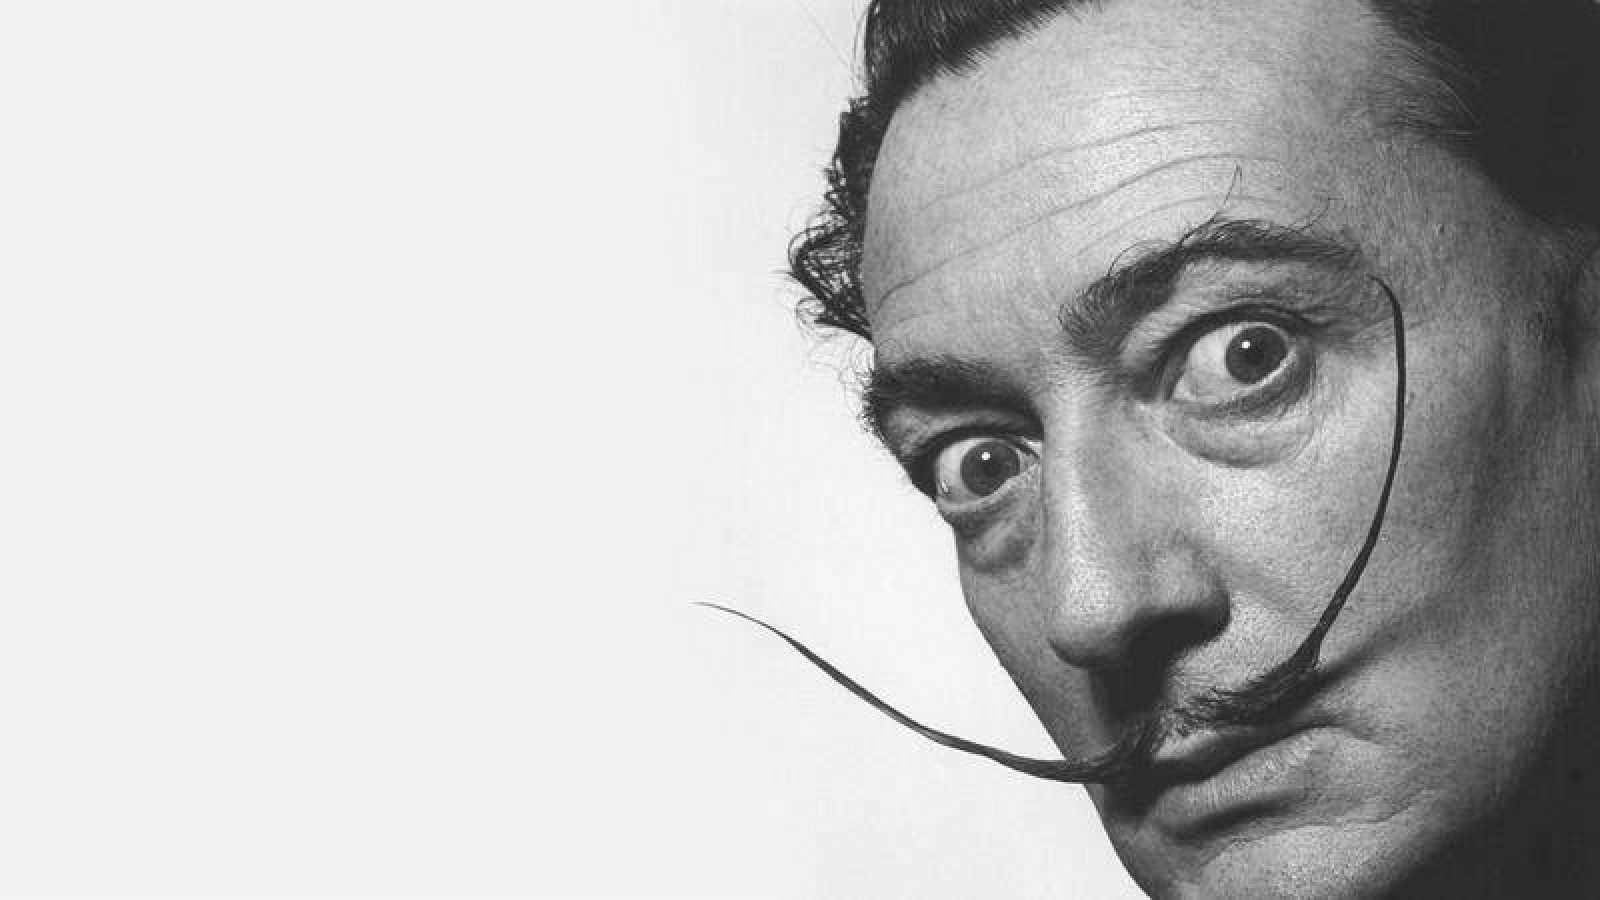 'Memoria de delfín' homenajea a Salvador Dalí